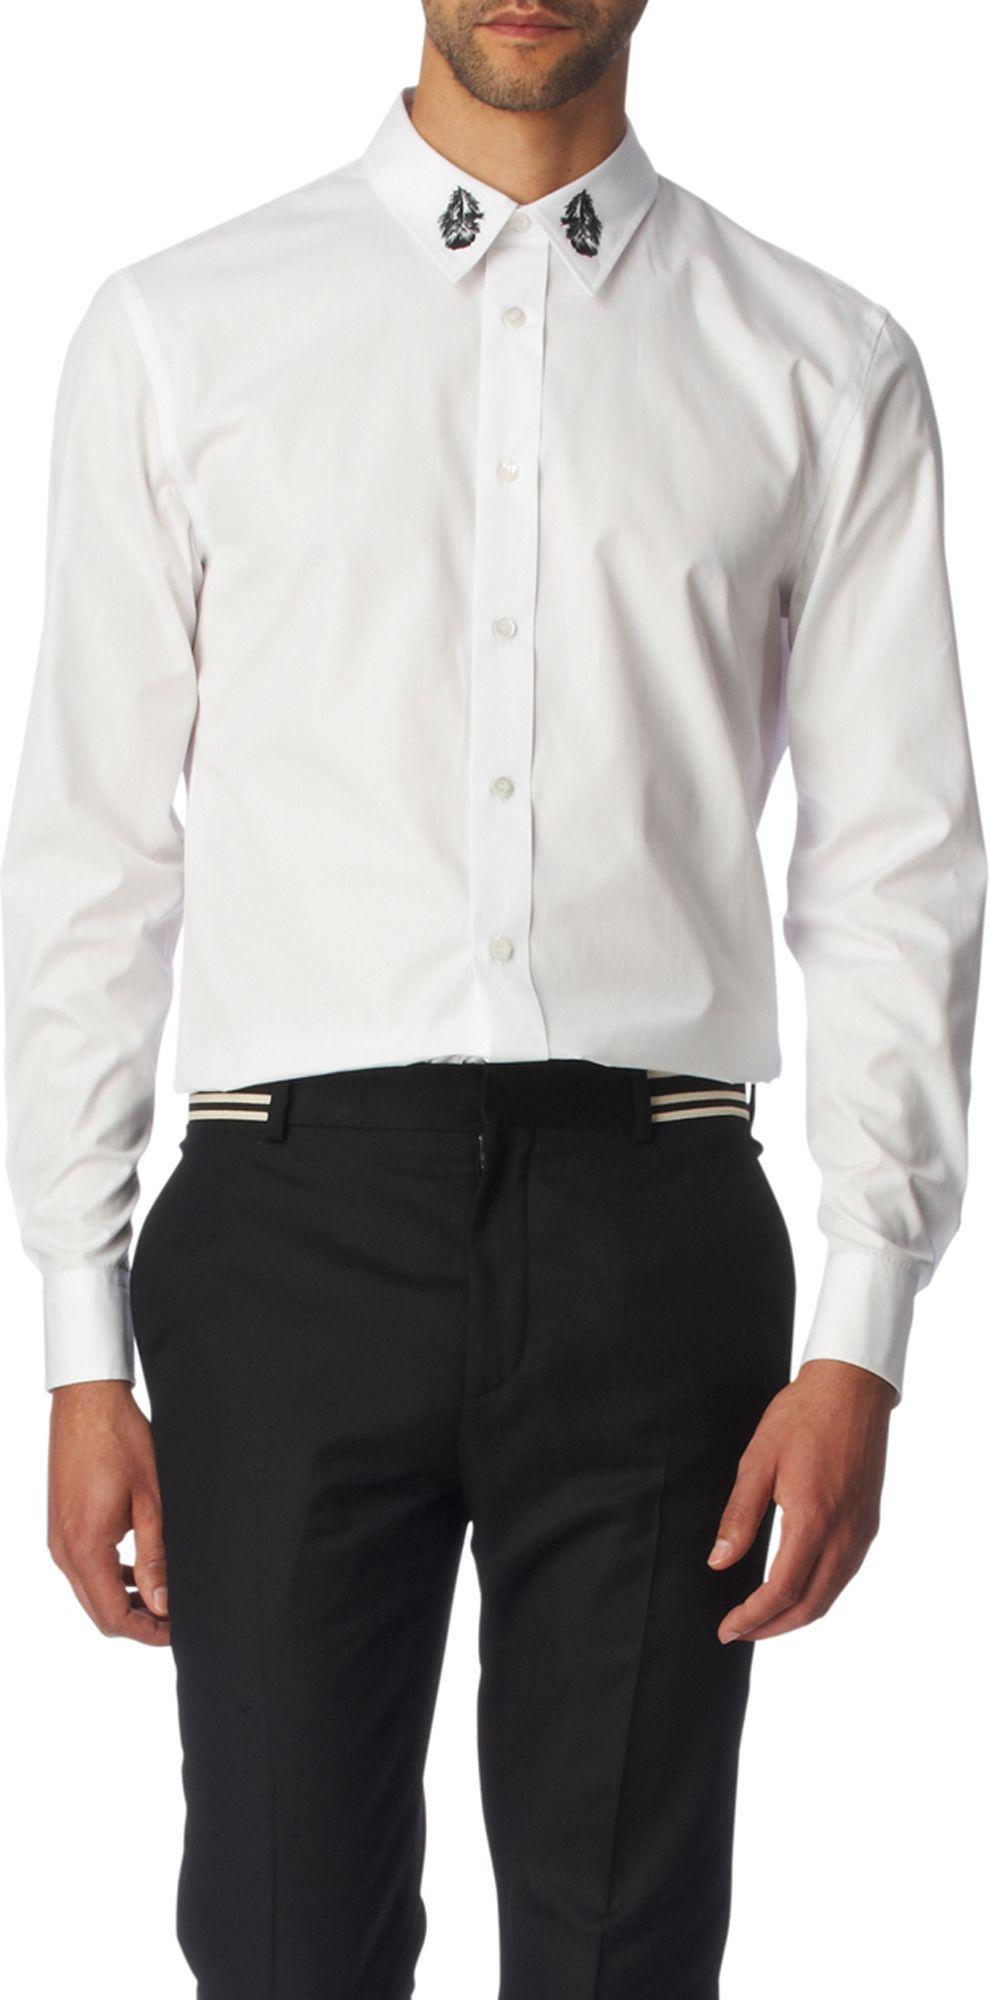 Alexander mcqueen embroidered collar slim fit single cuff